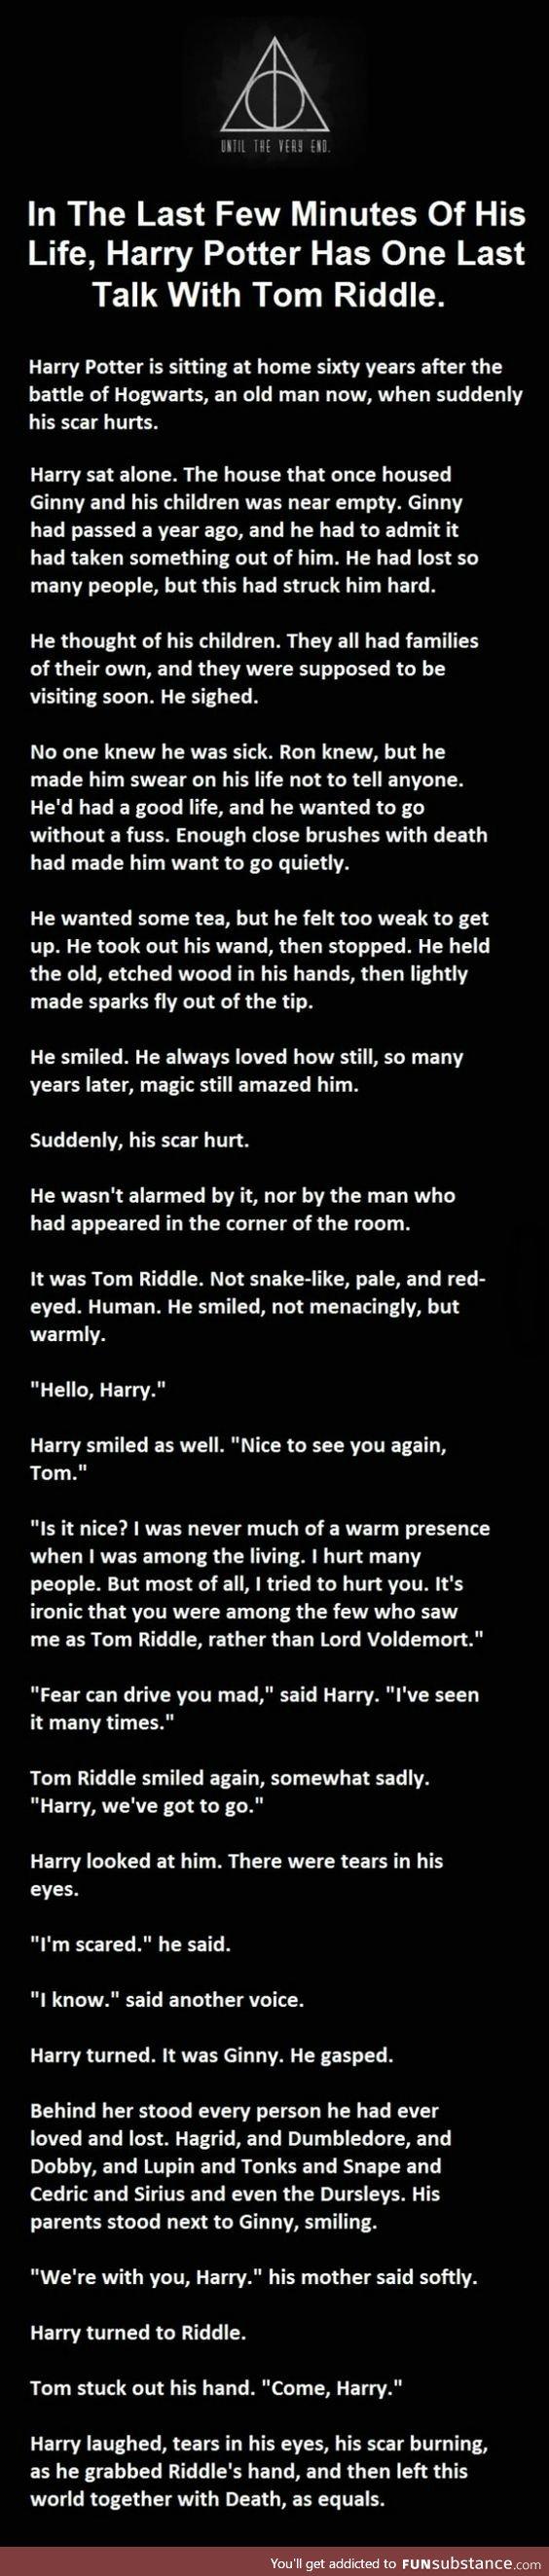 Quite a story